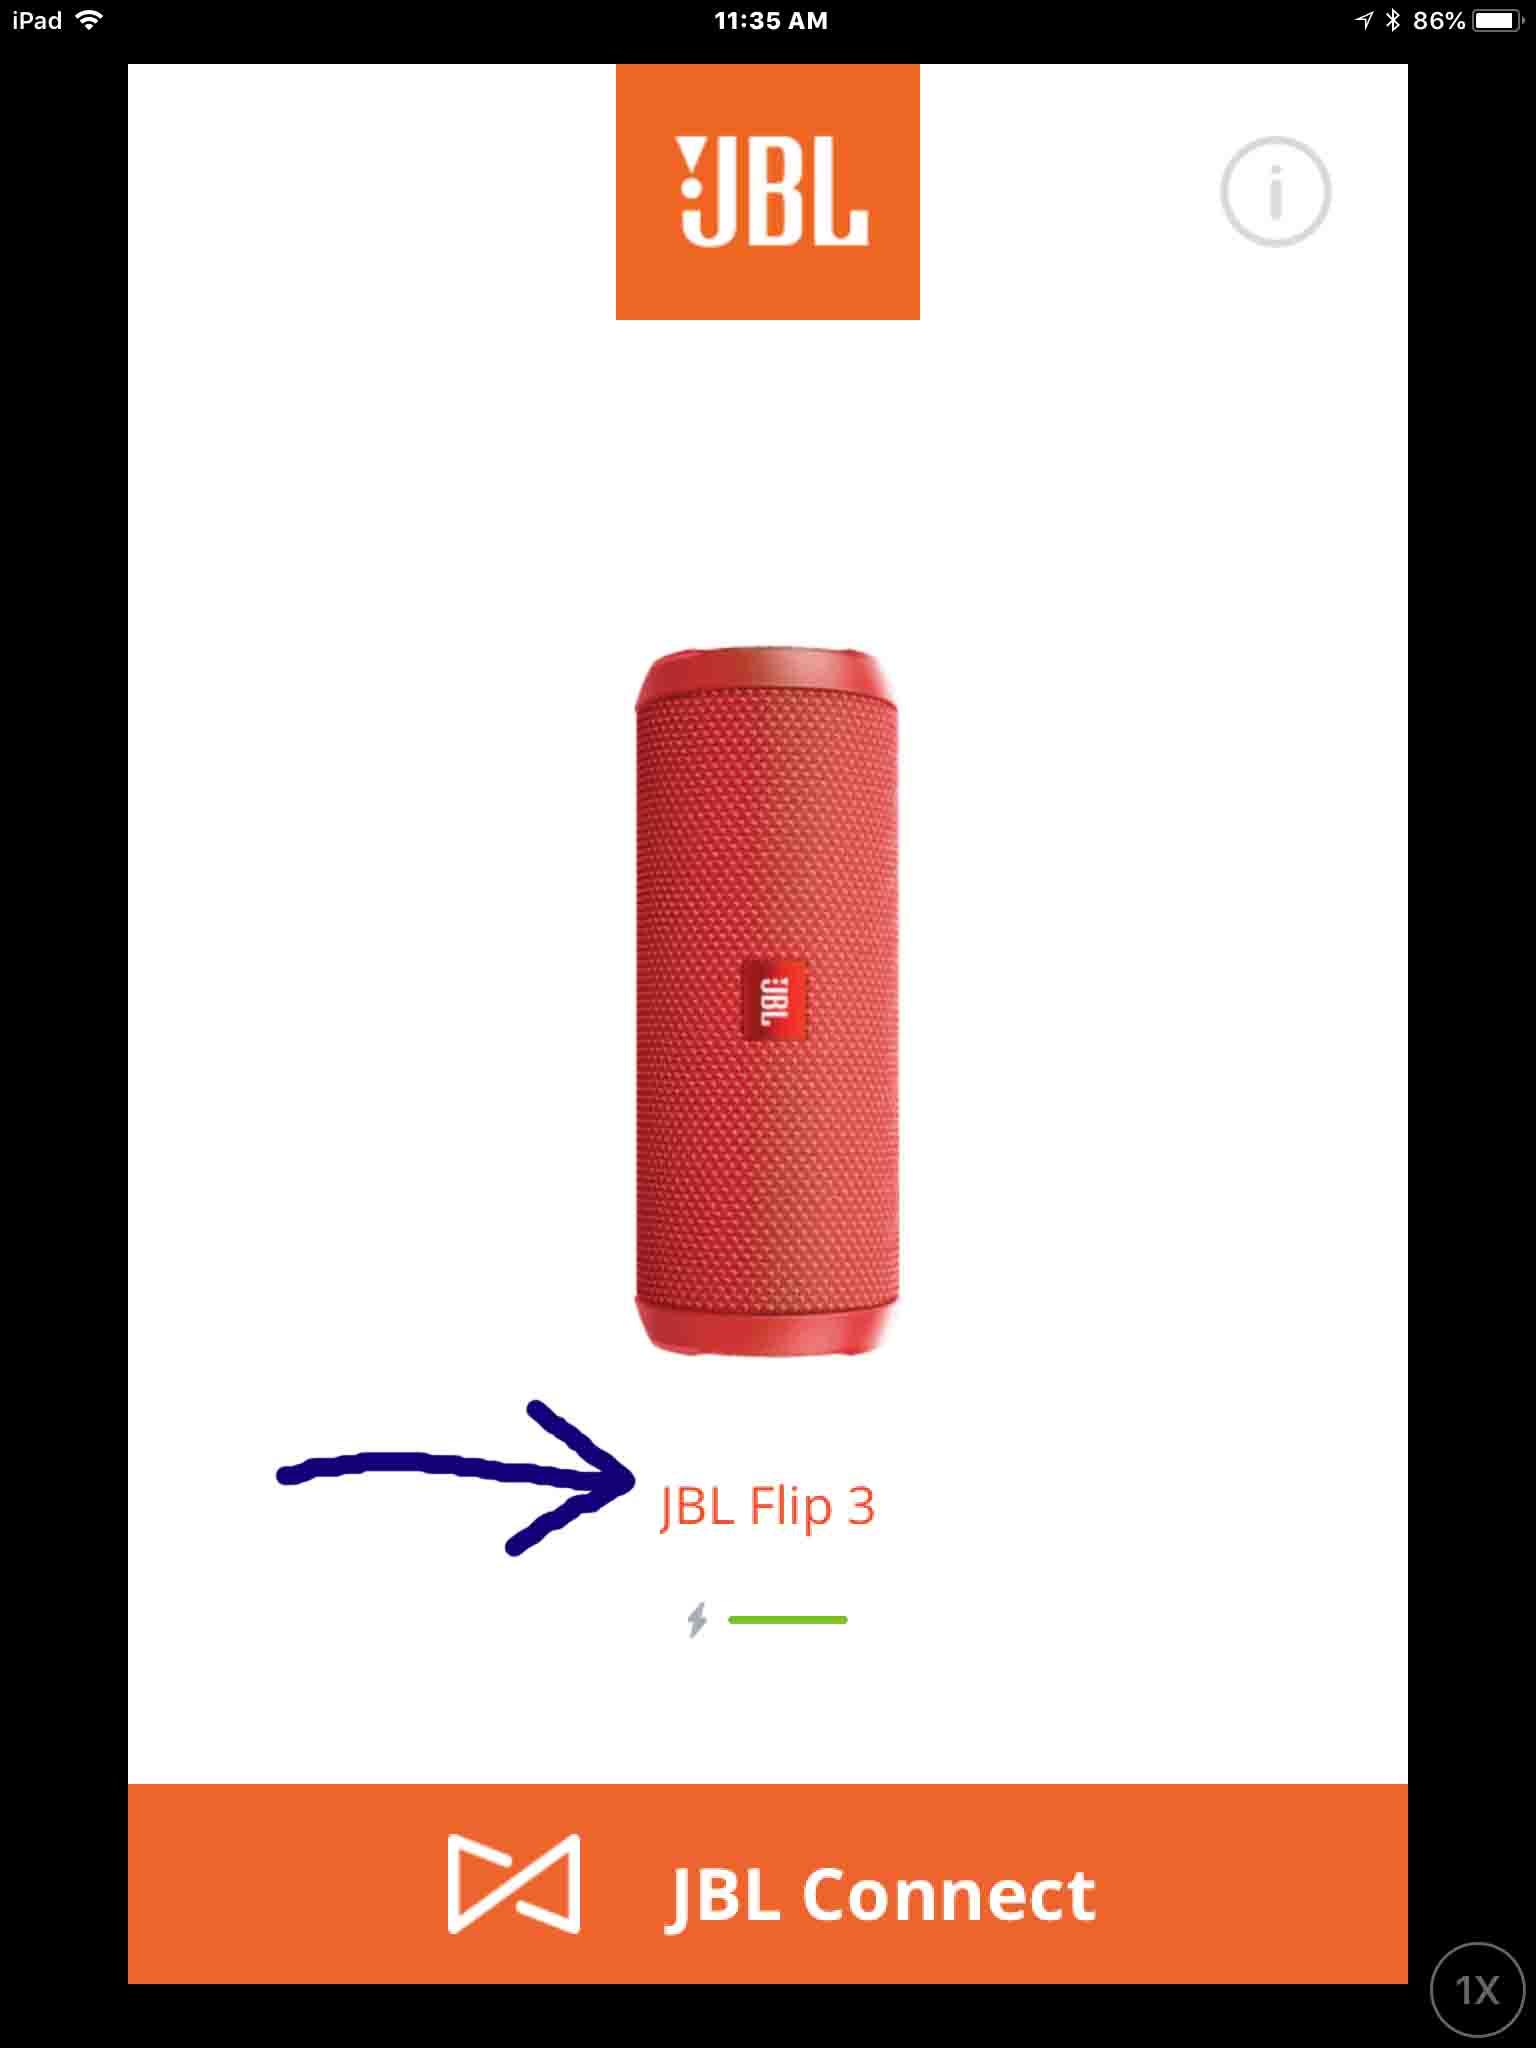 JBL Flip 3 Change Name, How to Rename JBL Speaker | Tom's